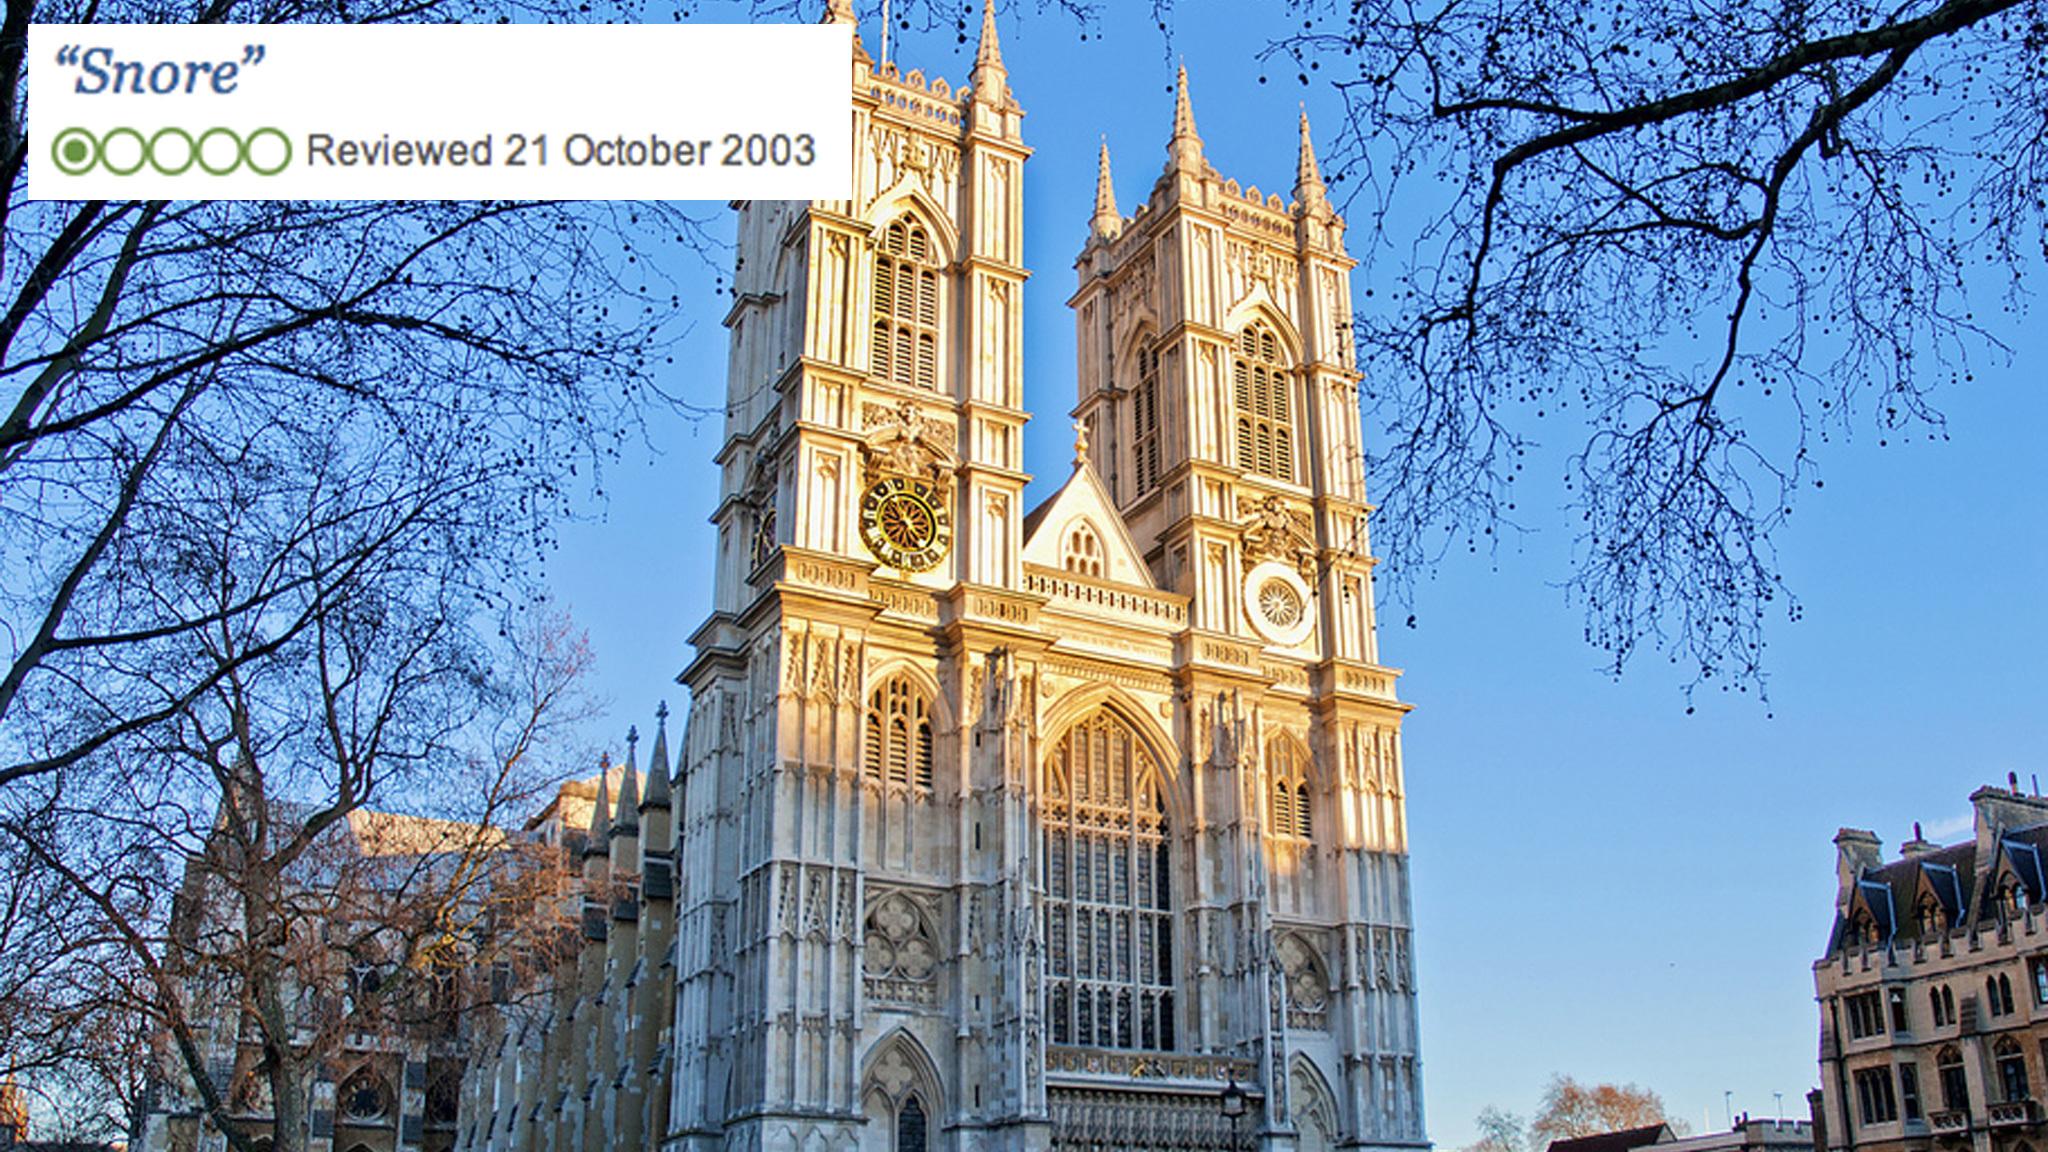 Westminster Abbey TripAdvisor review